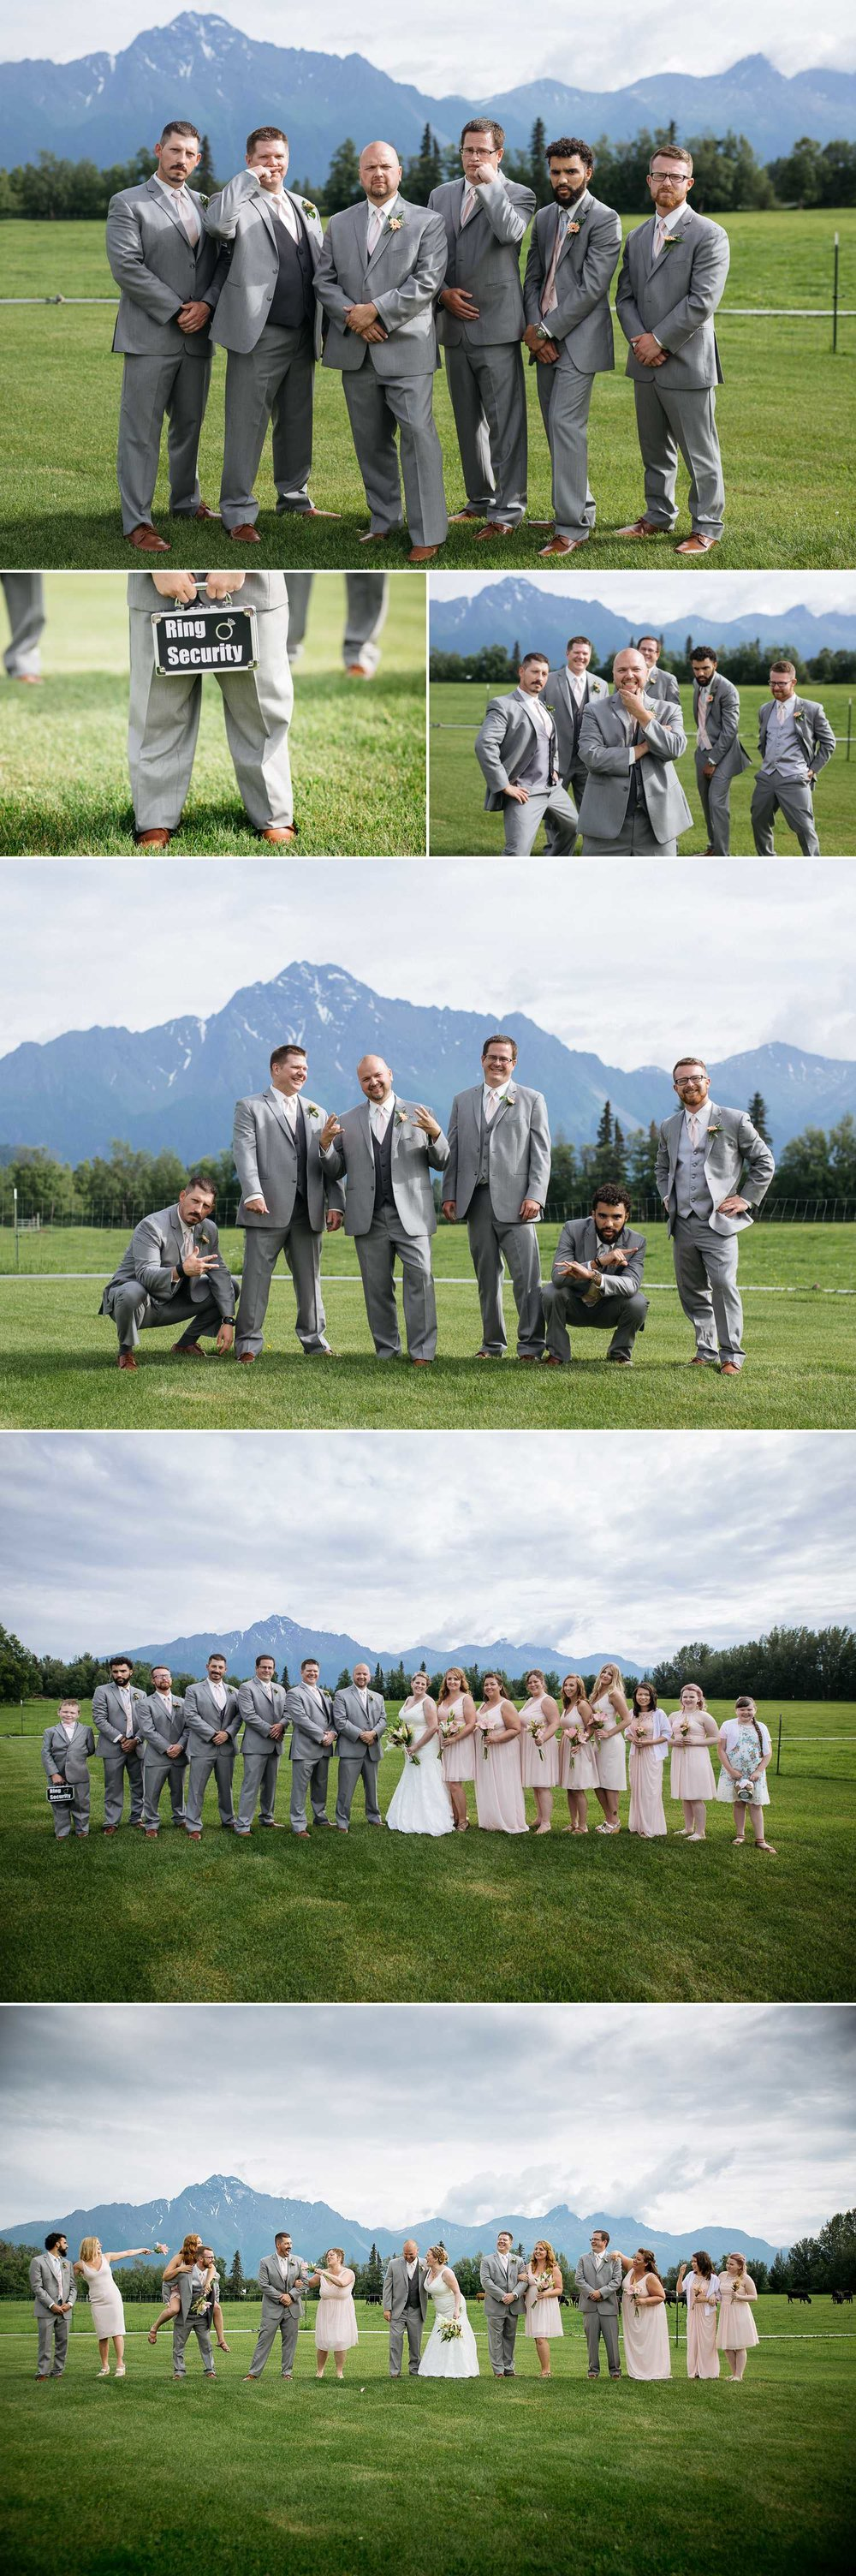 Turney Wedding Party